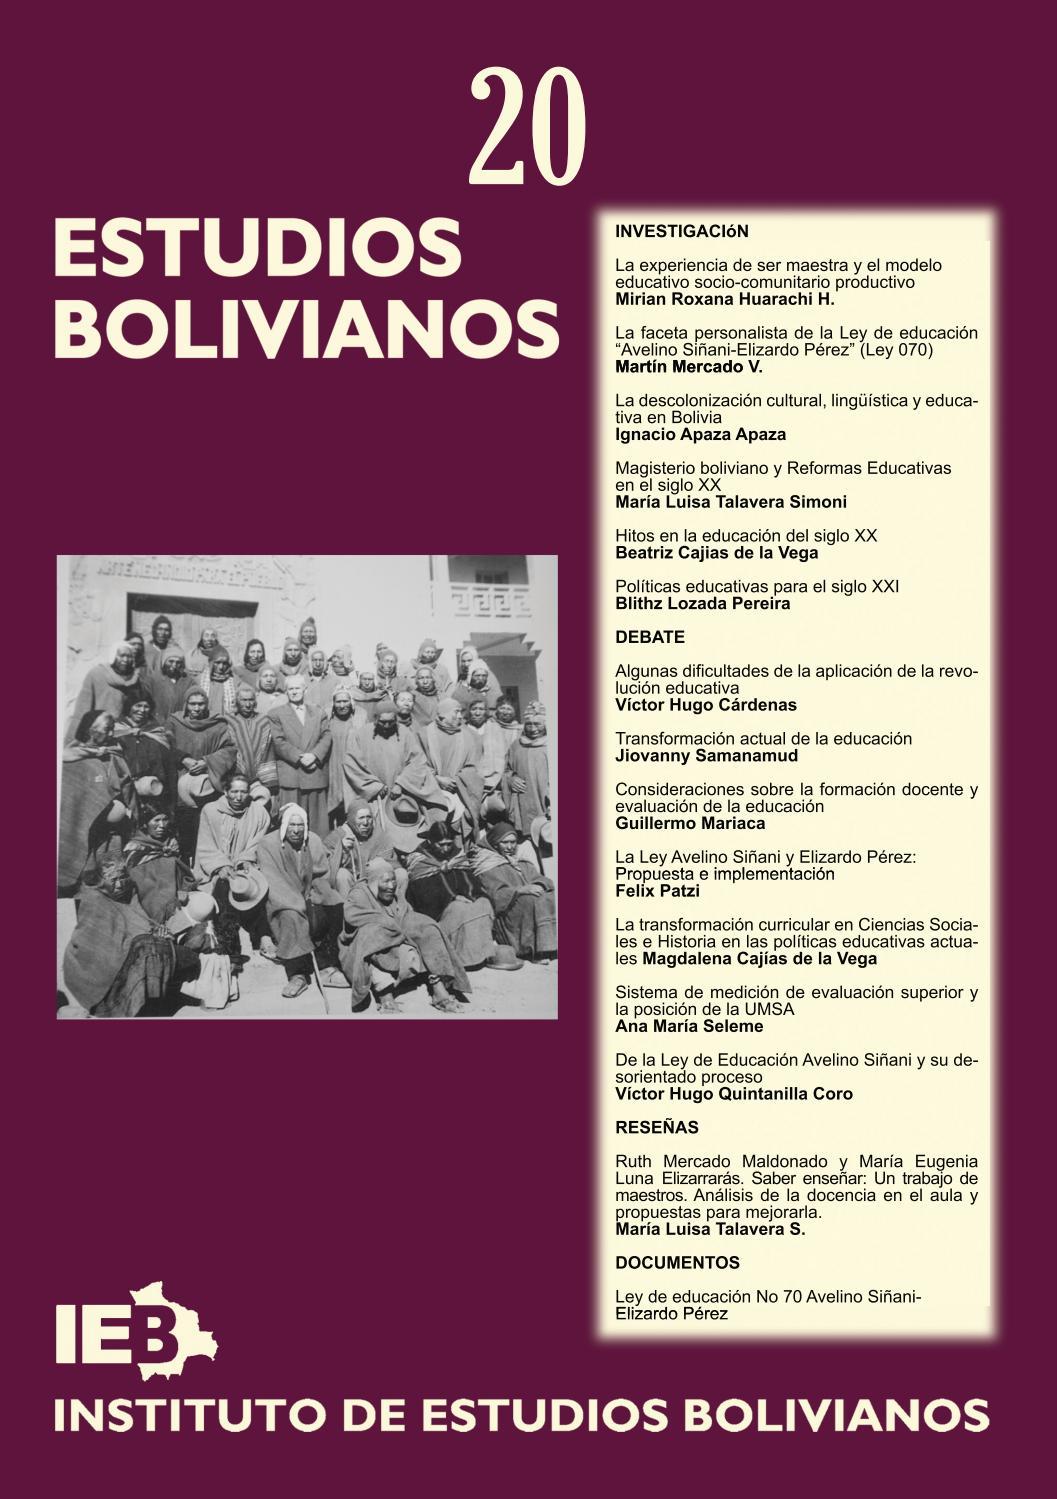 Estudios Bolivianos 020 by Postgrado Humanidades UMSA - issuu